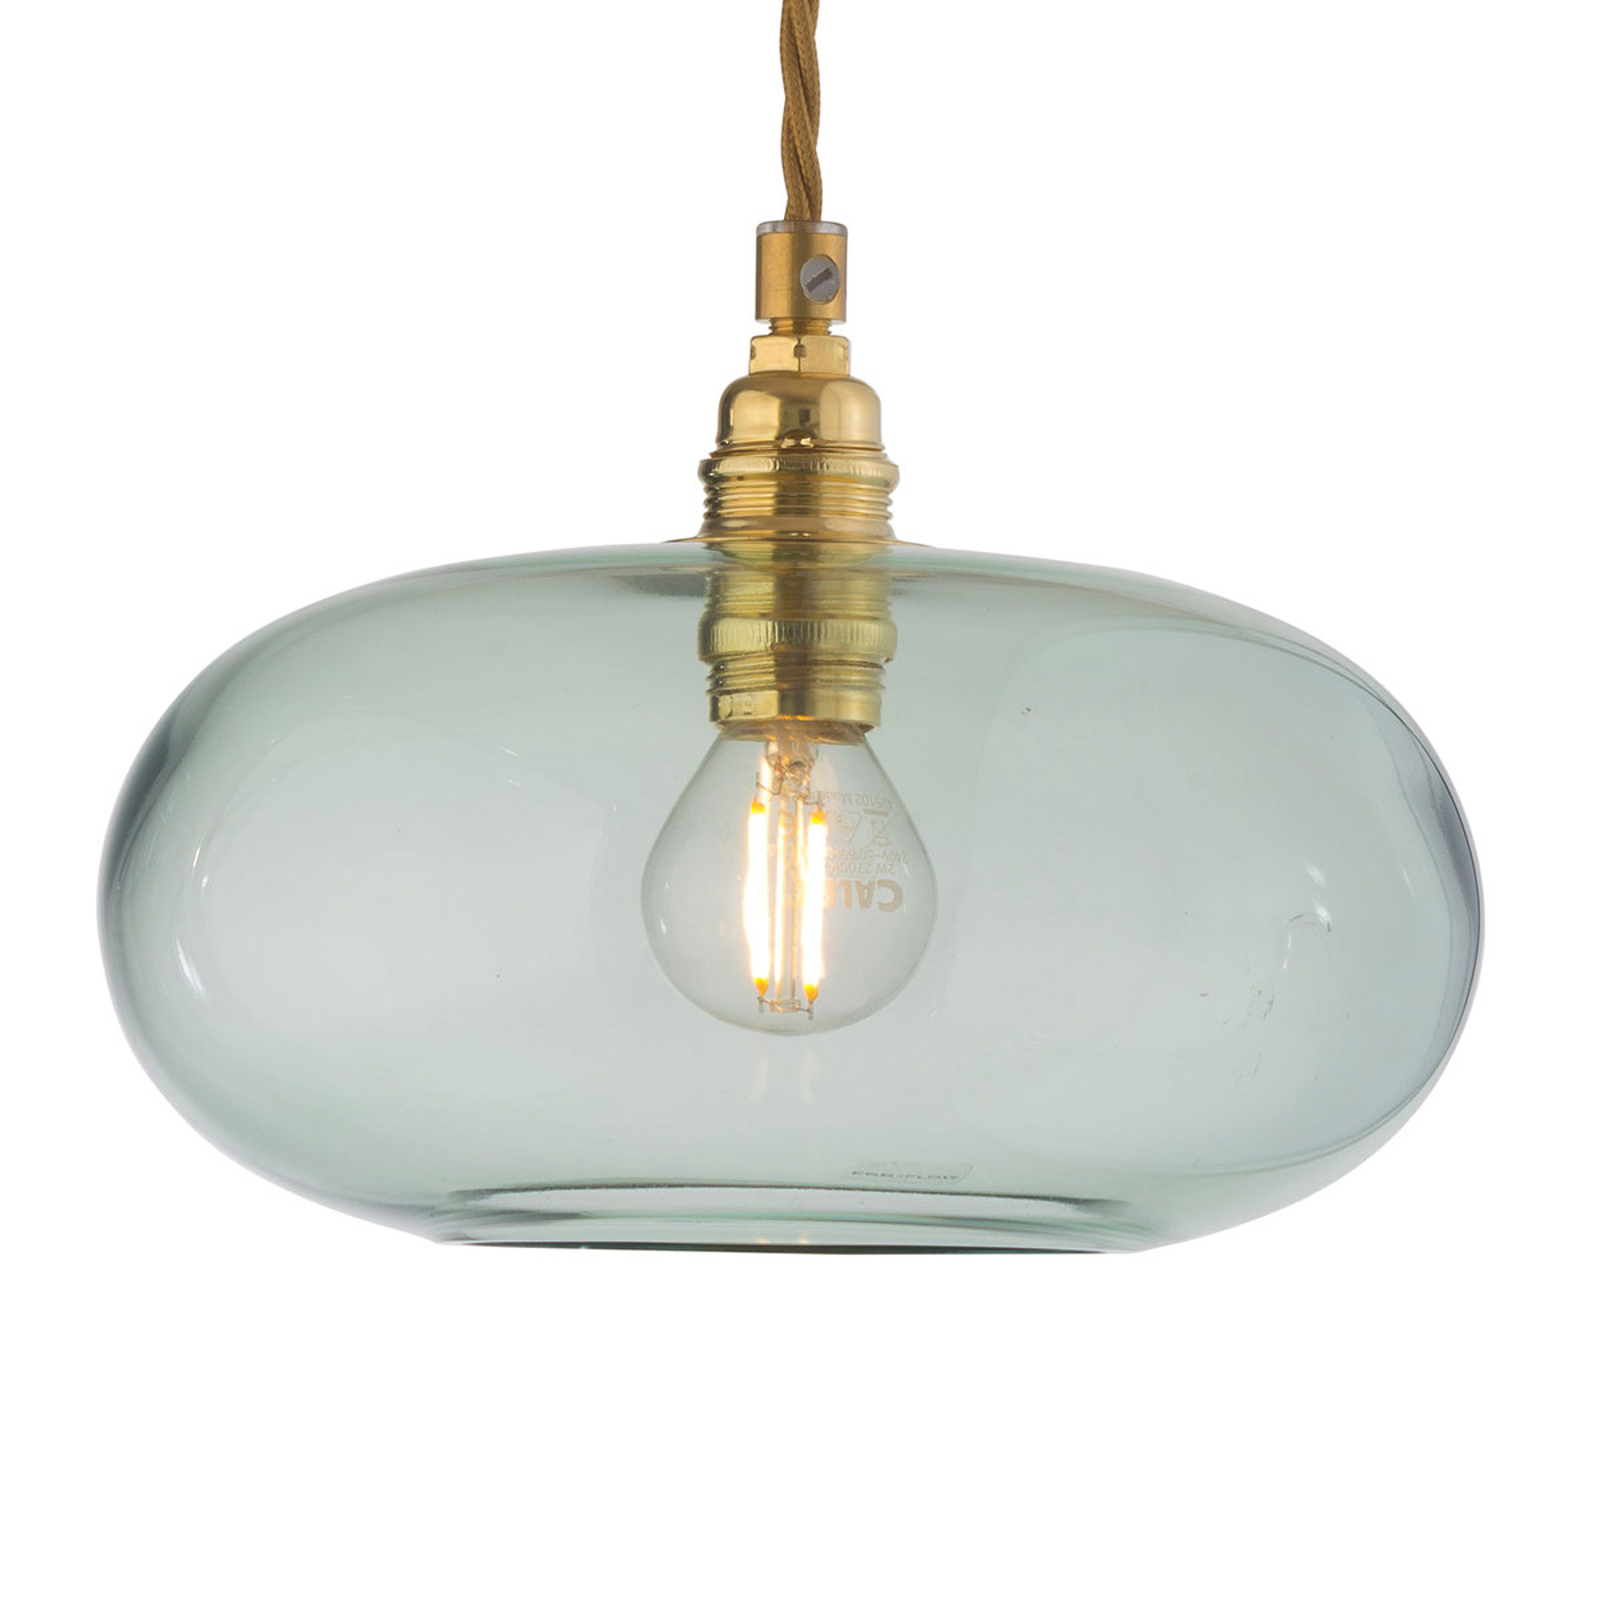 EBB & FLOW Horizon lampa wisząca zielona Ø 21 cm